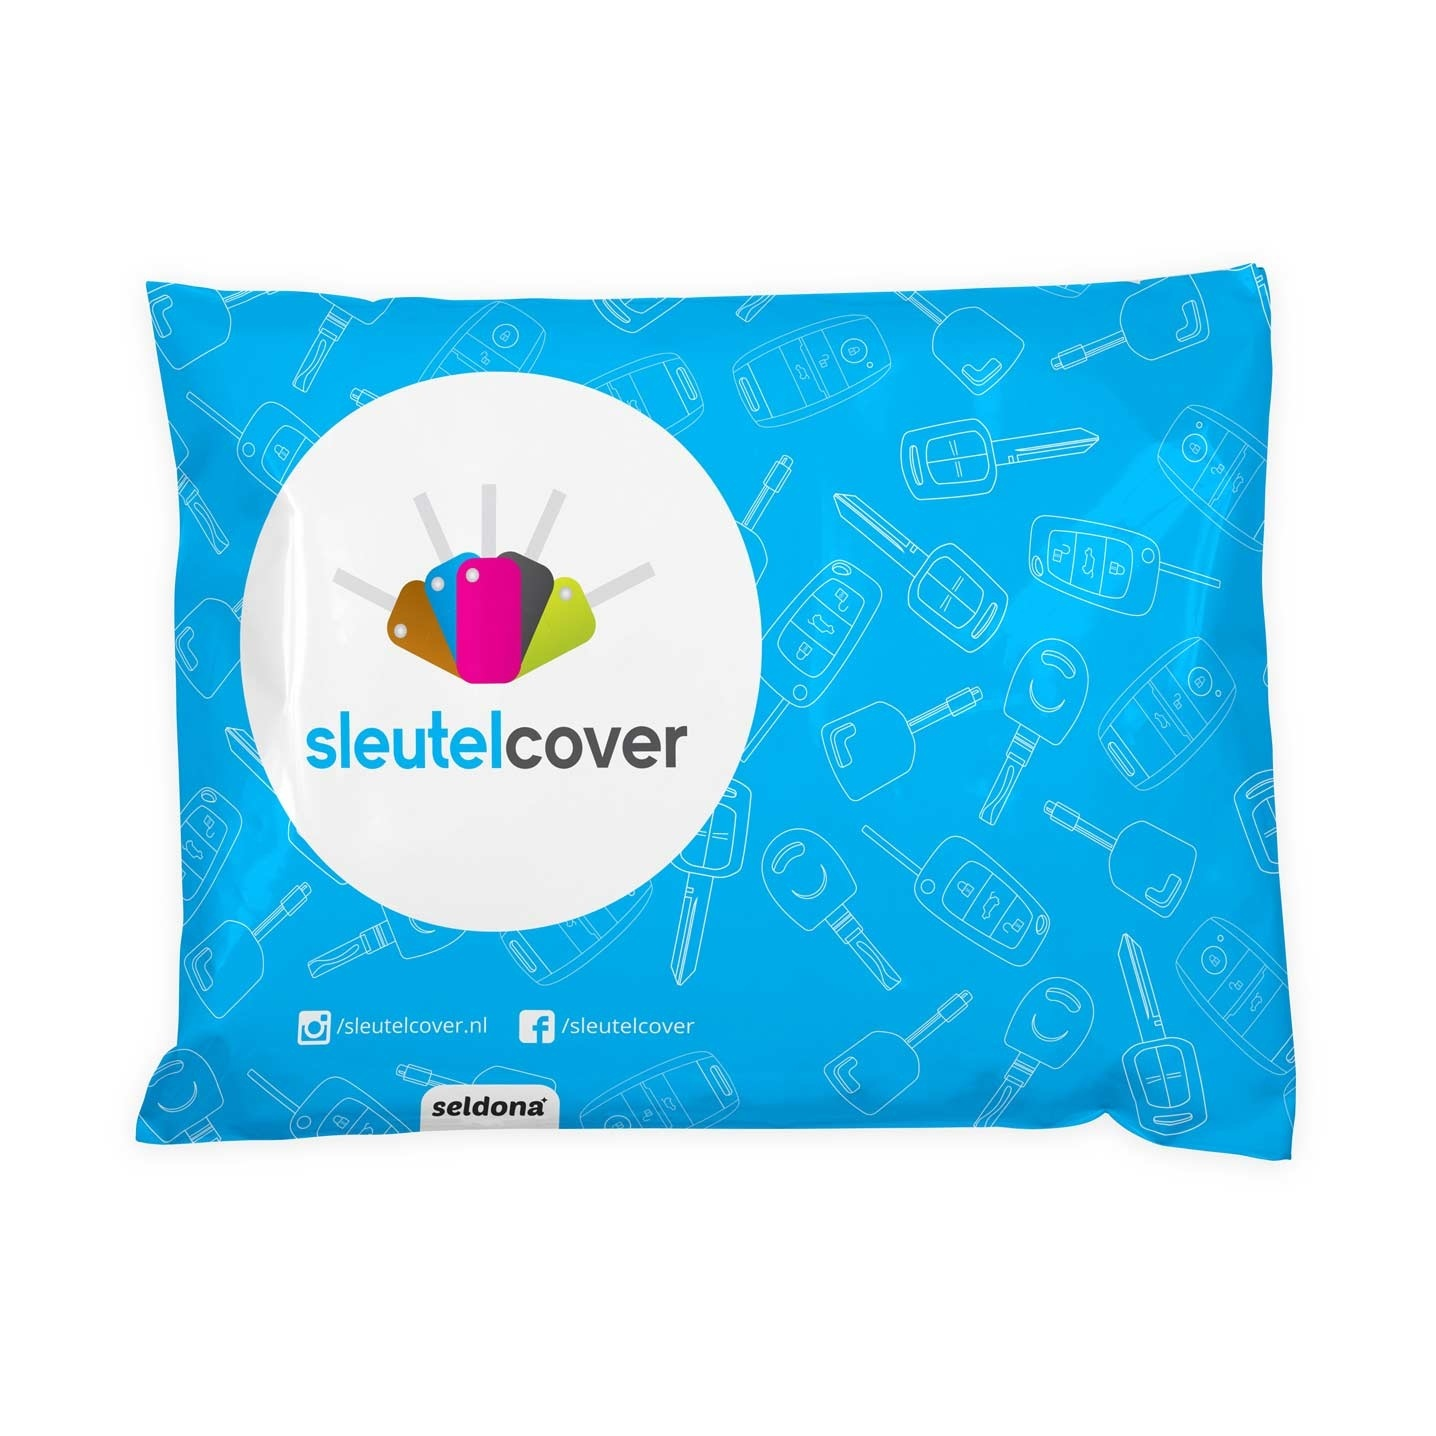 Skoda SleutelCover - Chroom / TPU sleutelhoesje / beschermhoesje autosleutel